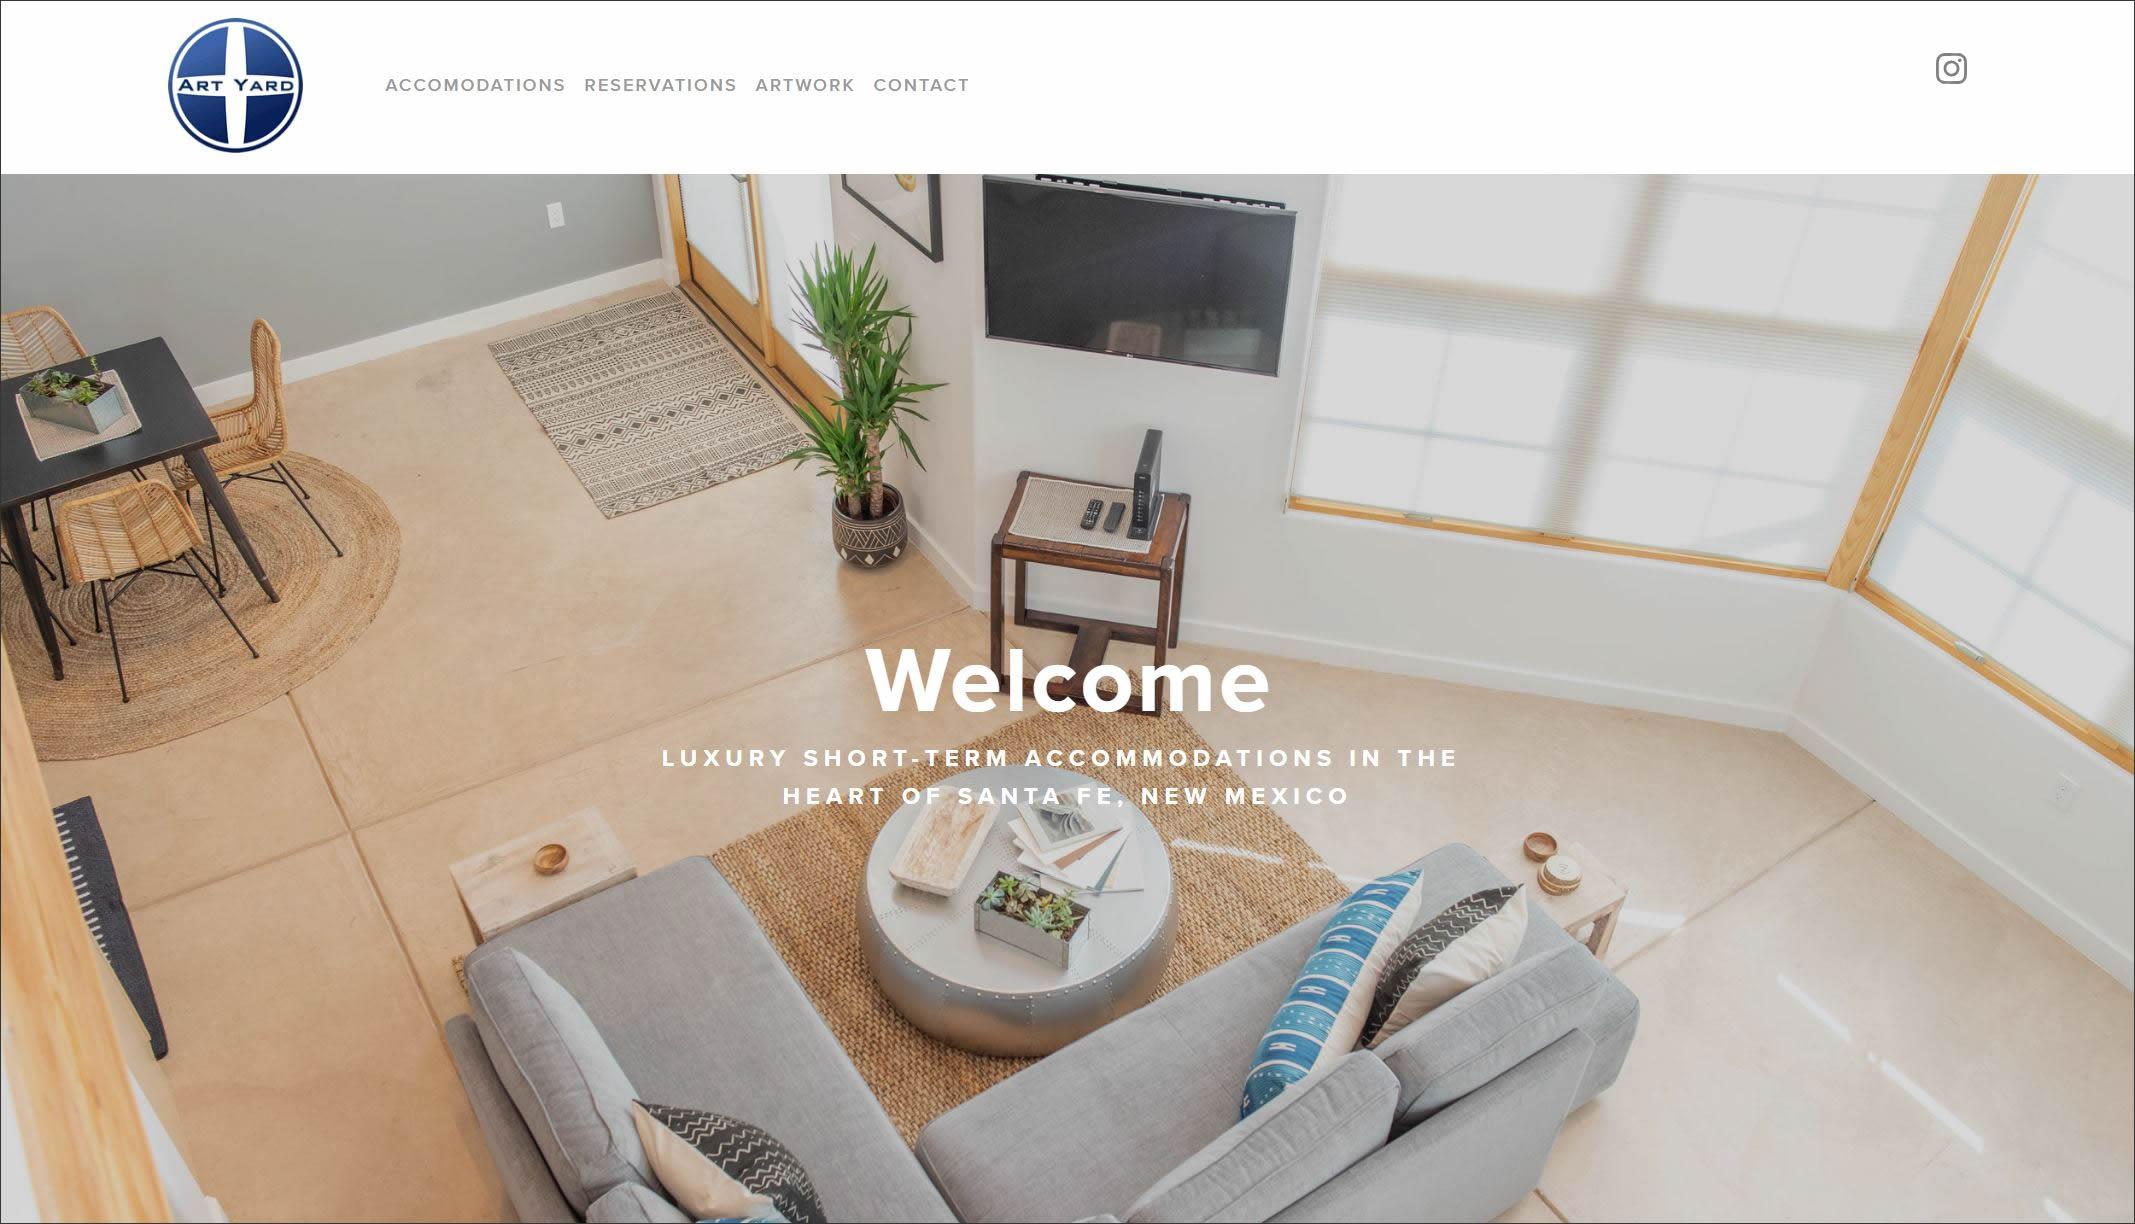 The ArtYard Lofts website